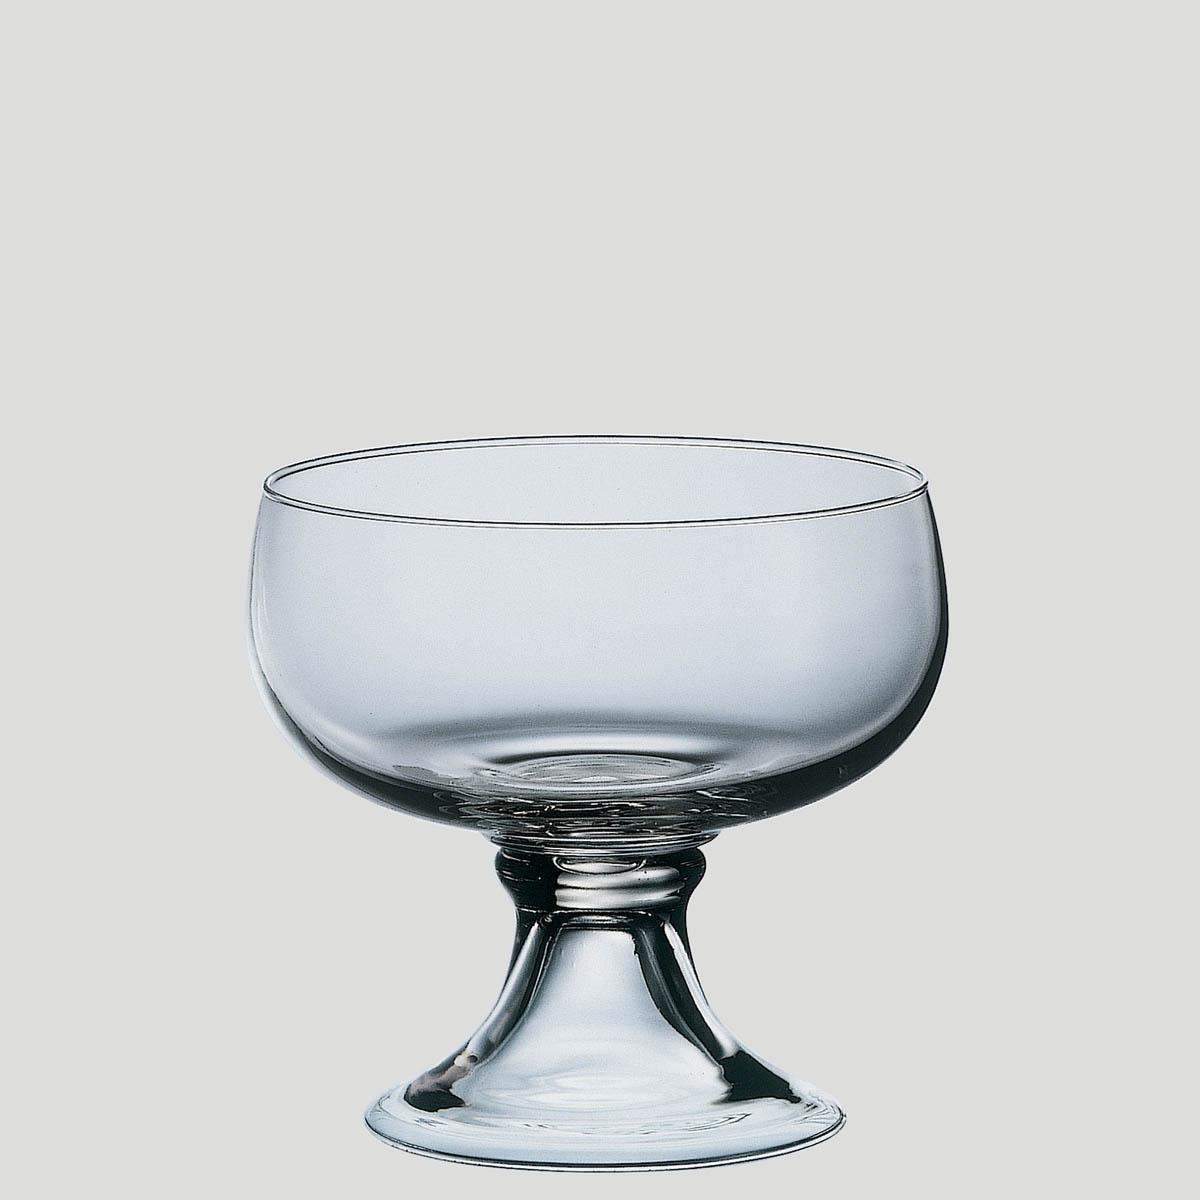 Coppa amicizia - coppa in vetro grande - Gardagel